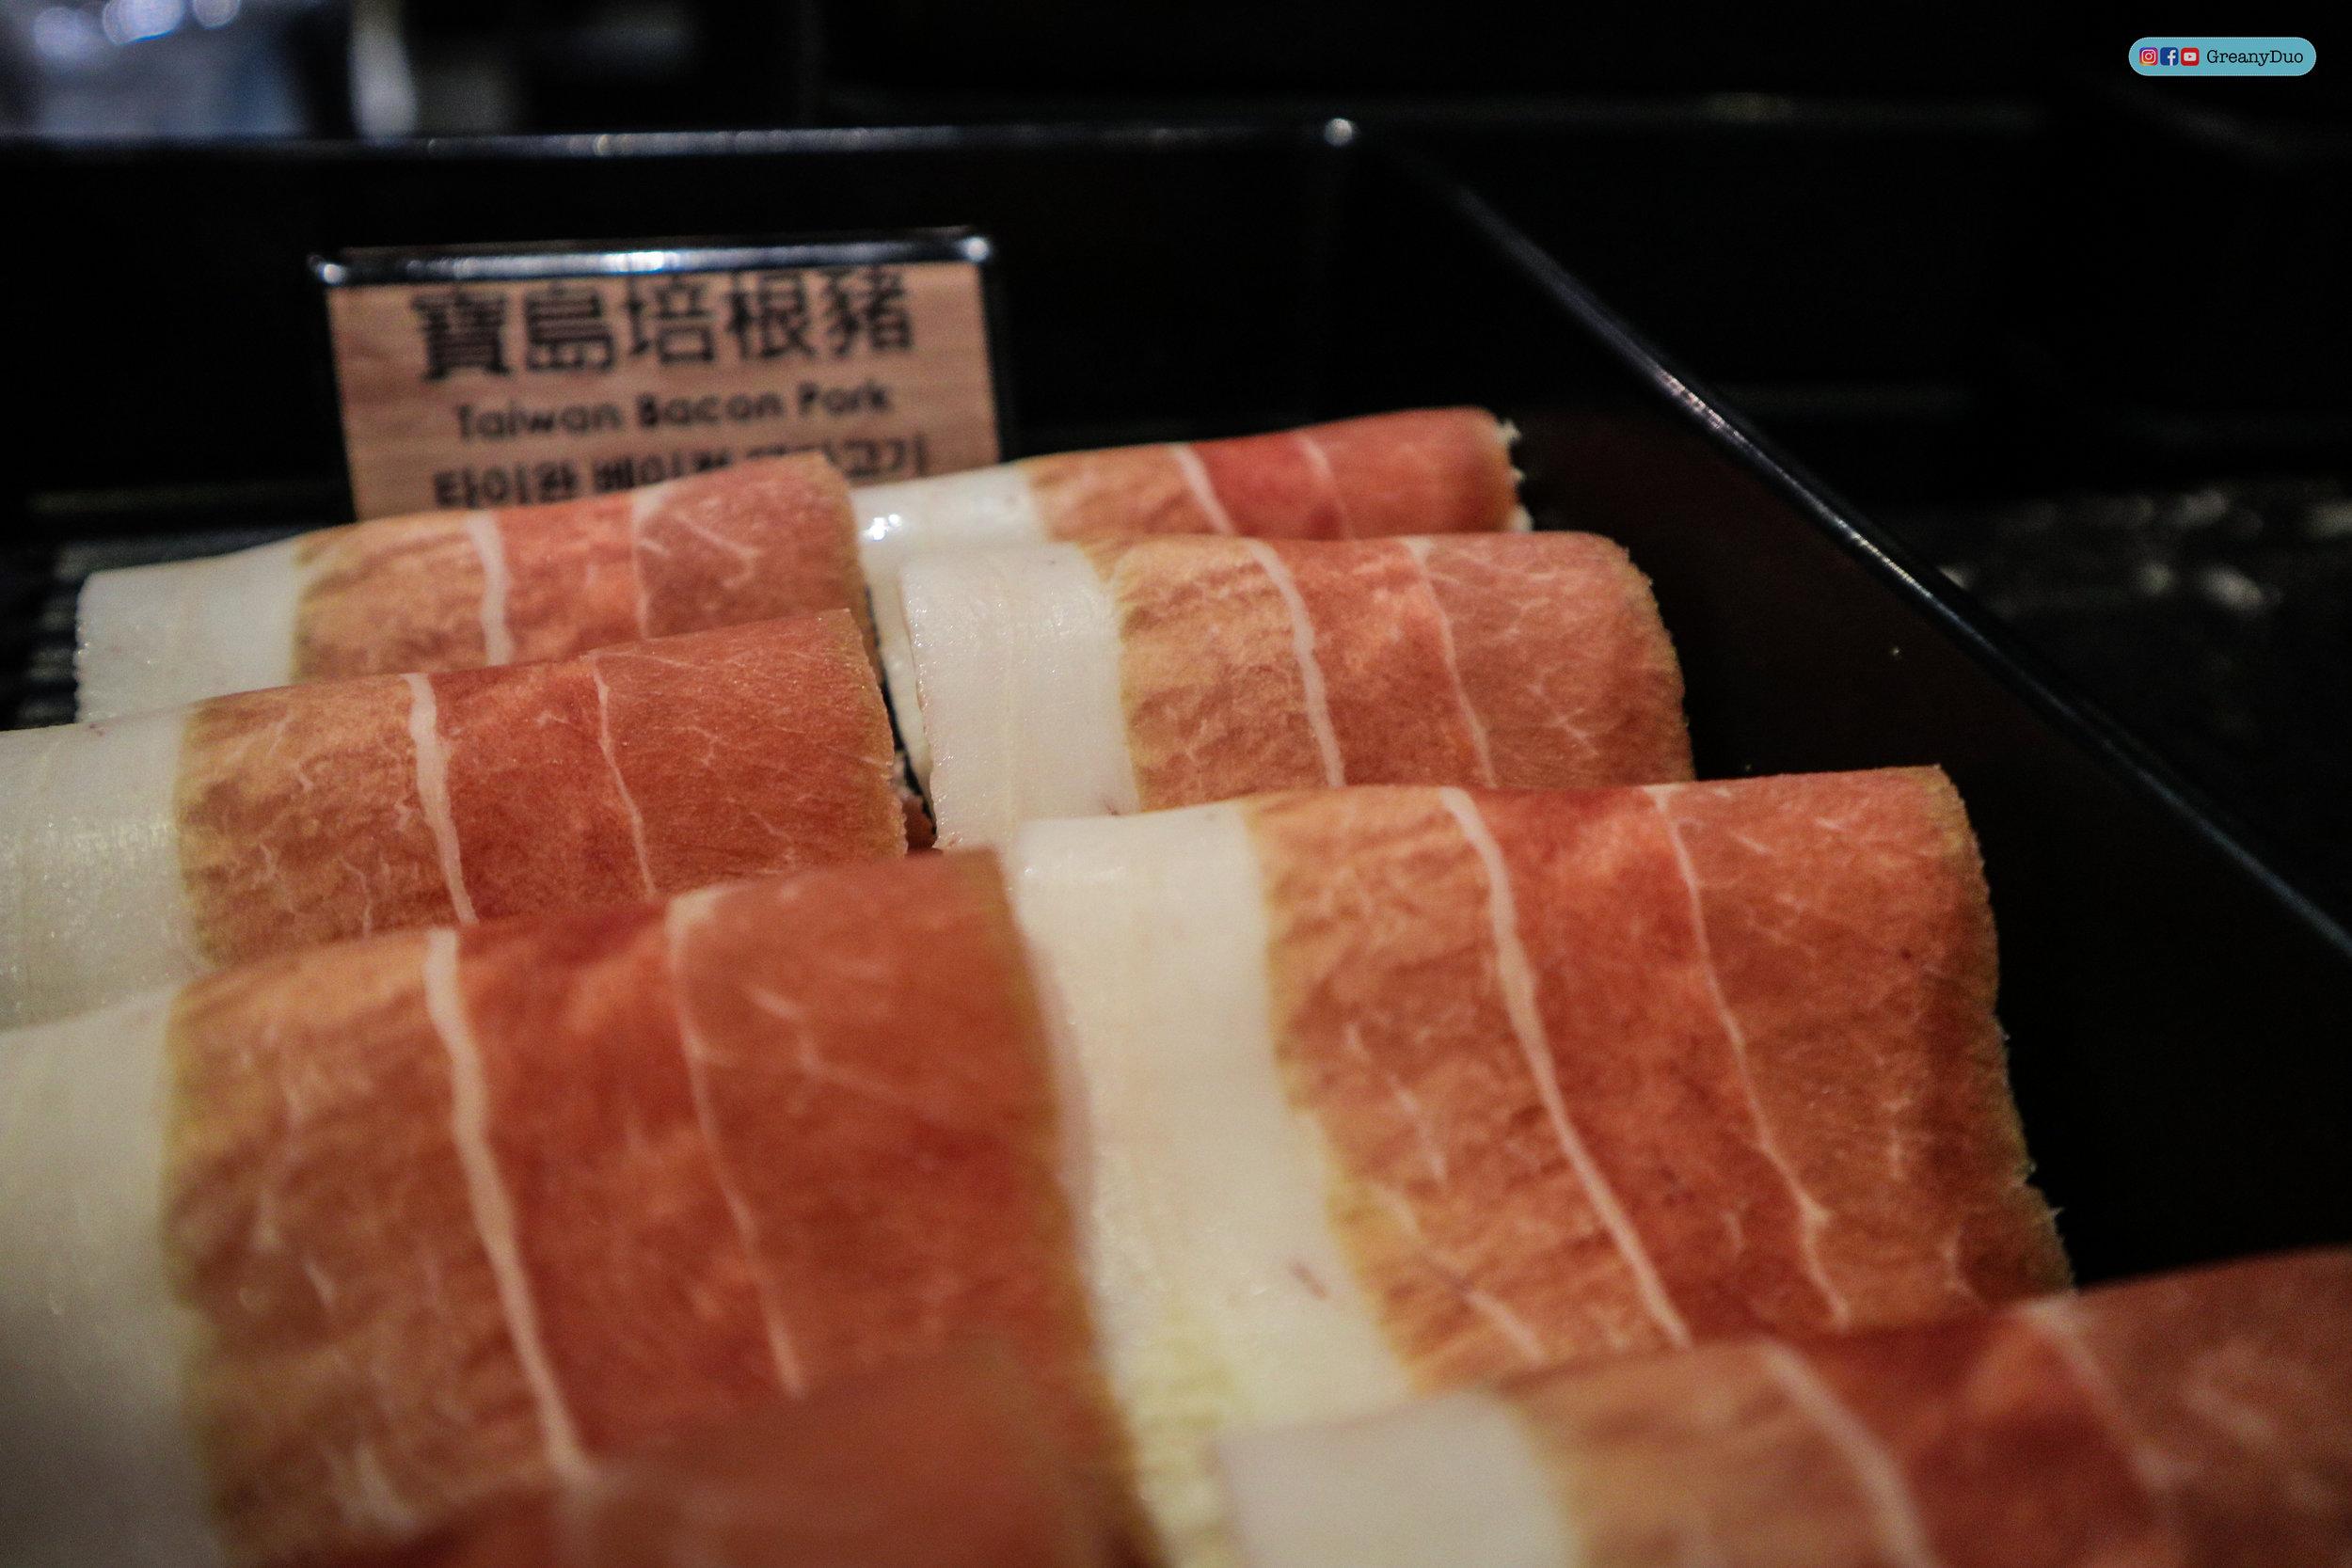 bacon pork at บุฟเฟ่ต์ชาบูไต้หวันที่ Hakkai Shabu Shabu ซีเหมินติง